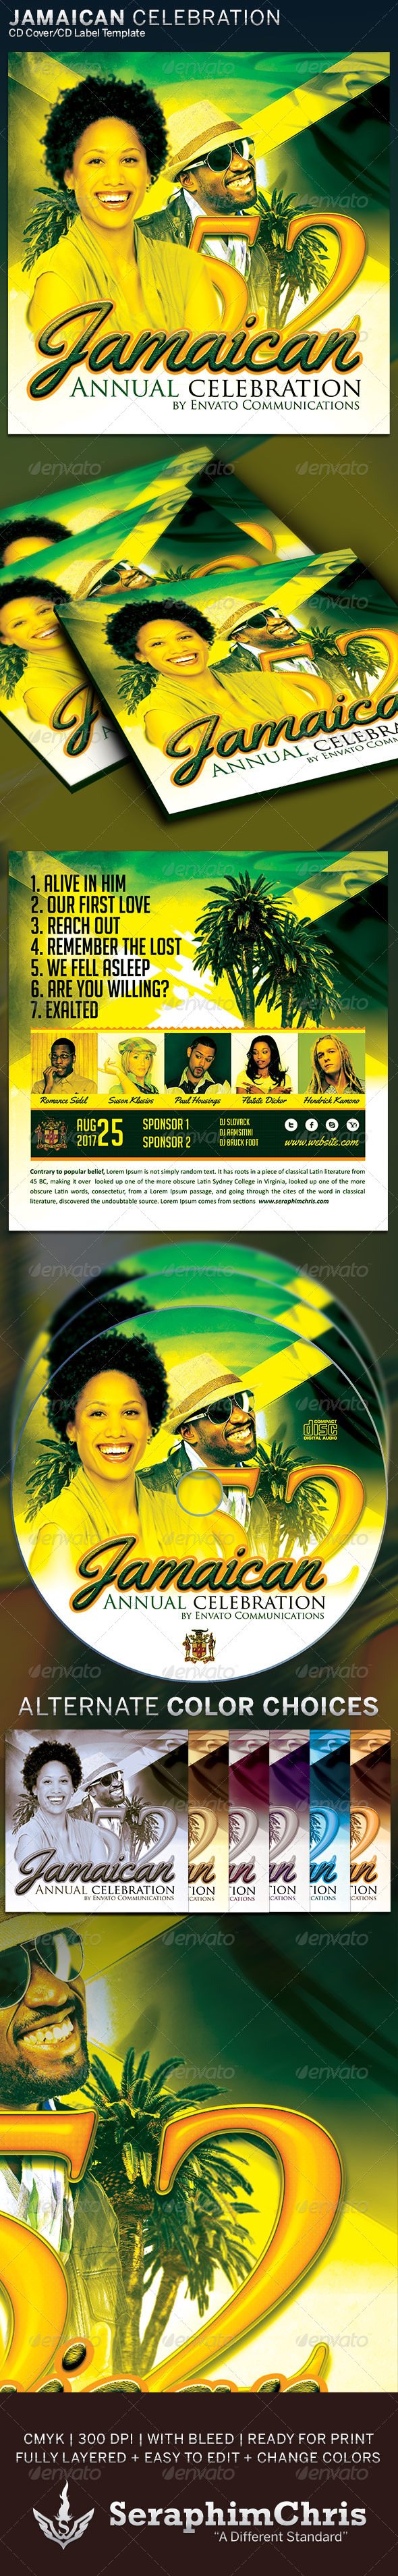 Jamaica Independence Music CD Artwork Template - CD & DVD Artwork Print Templates